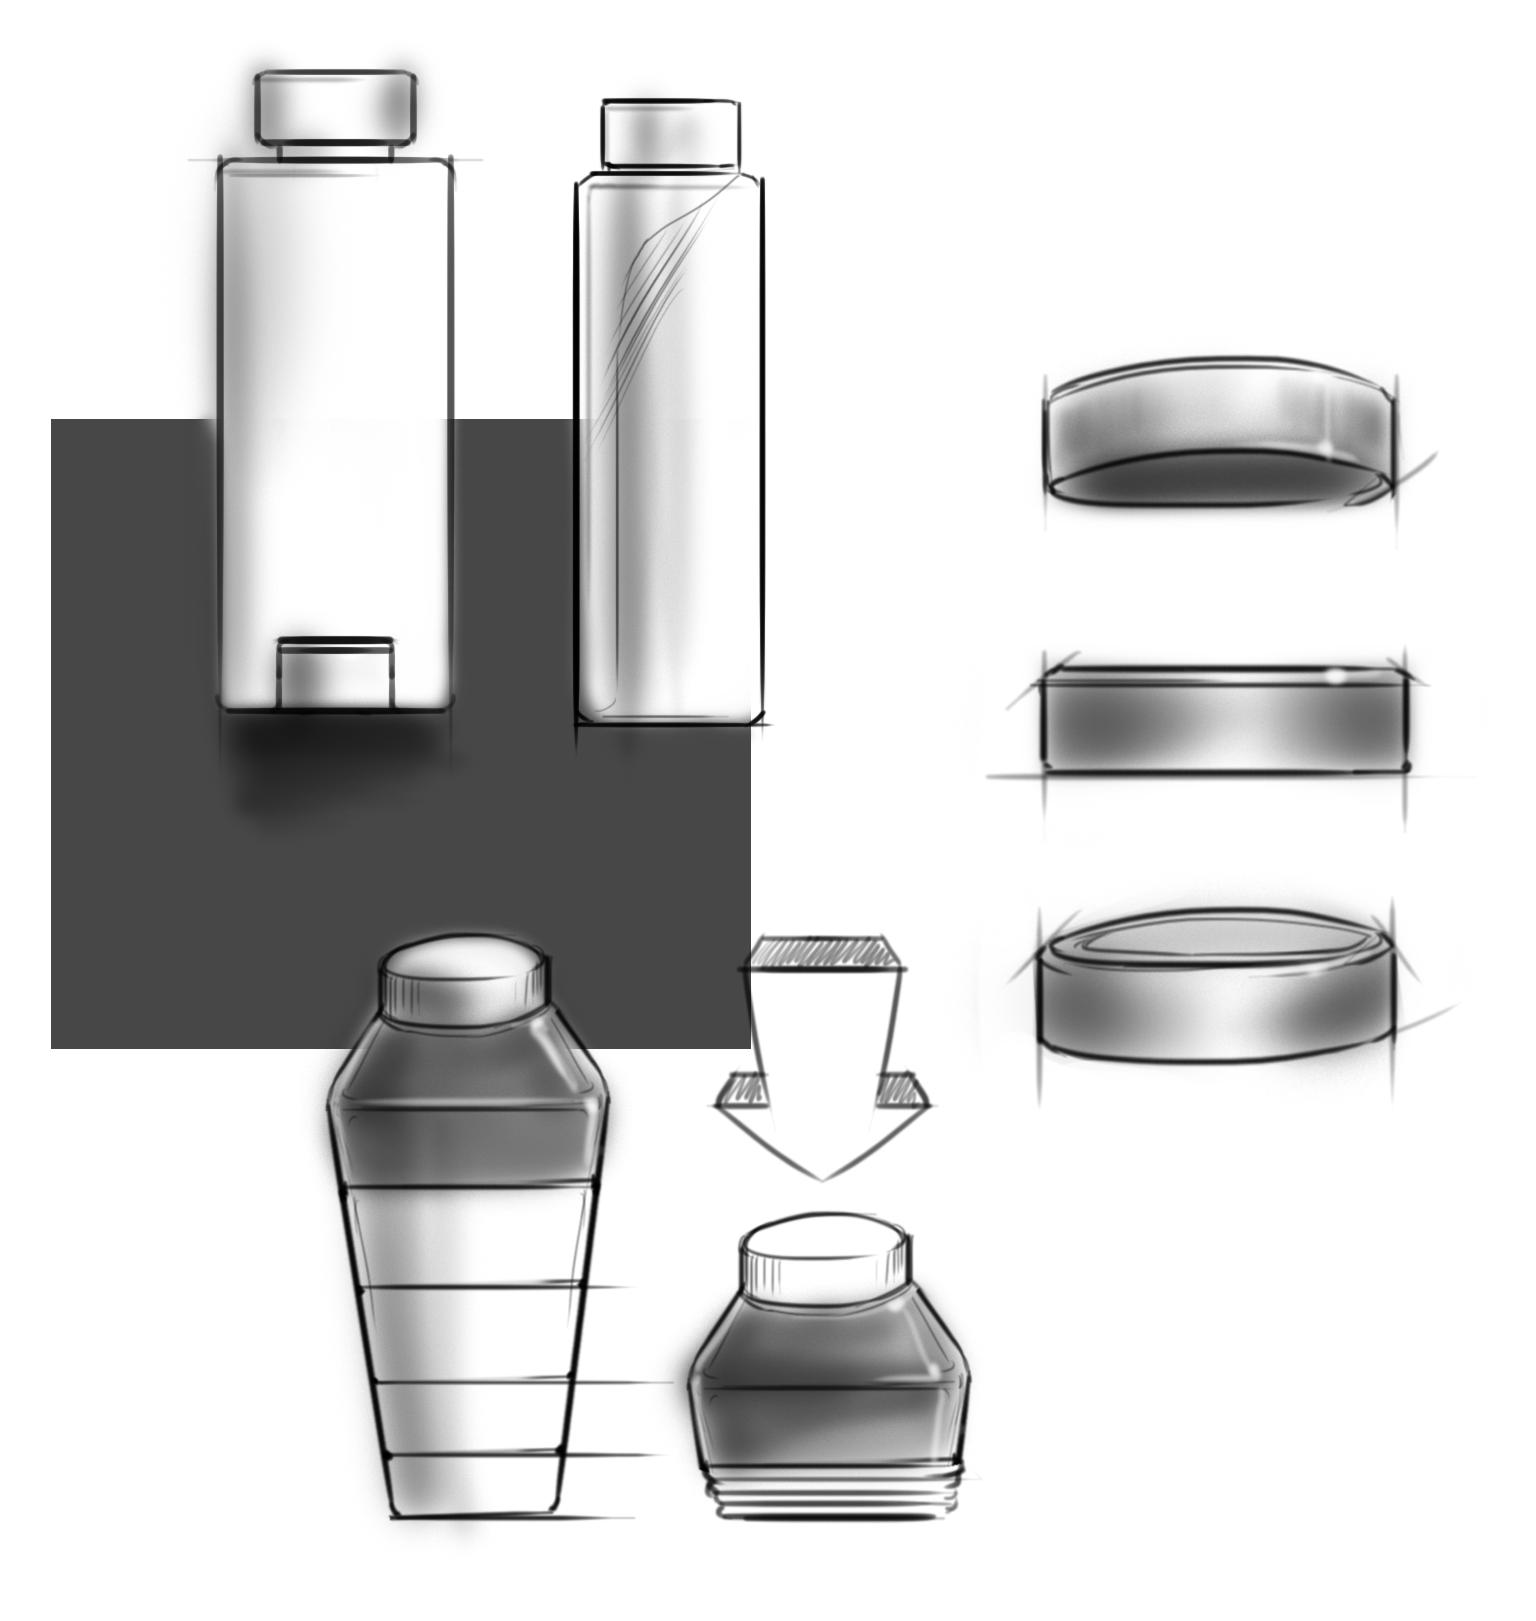 Sample Product Sketches/Renderings